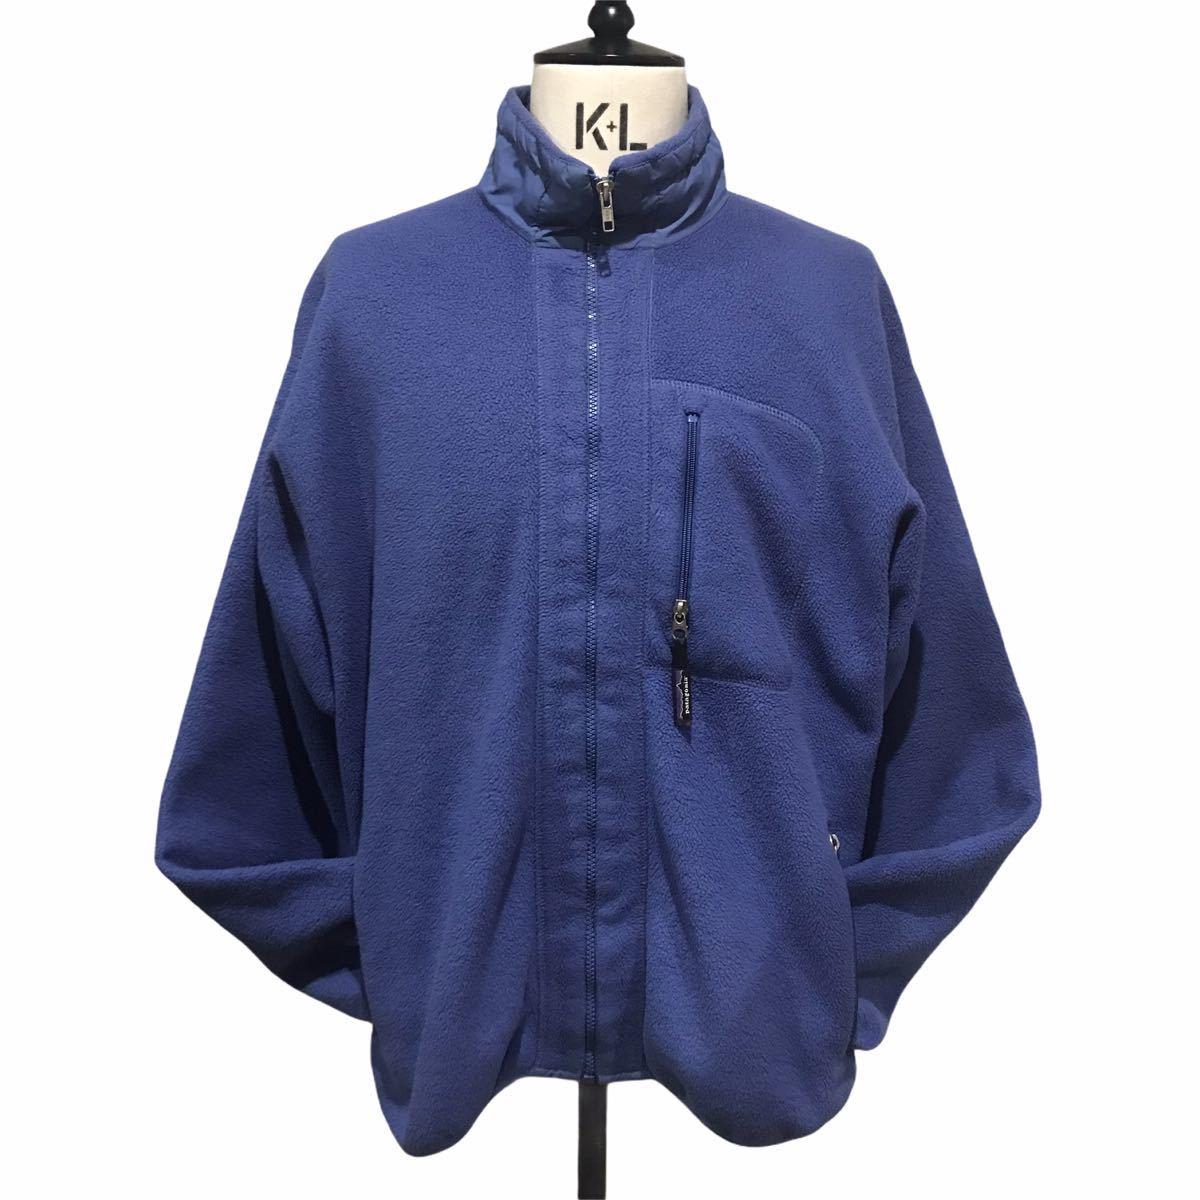 Patagonia Synchilla Jacket made in USA L パタゴニア シンチラジャケット フリース アメリカ製 L ブルー レトロカーデ